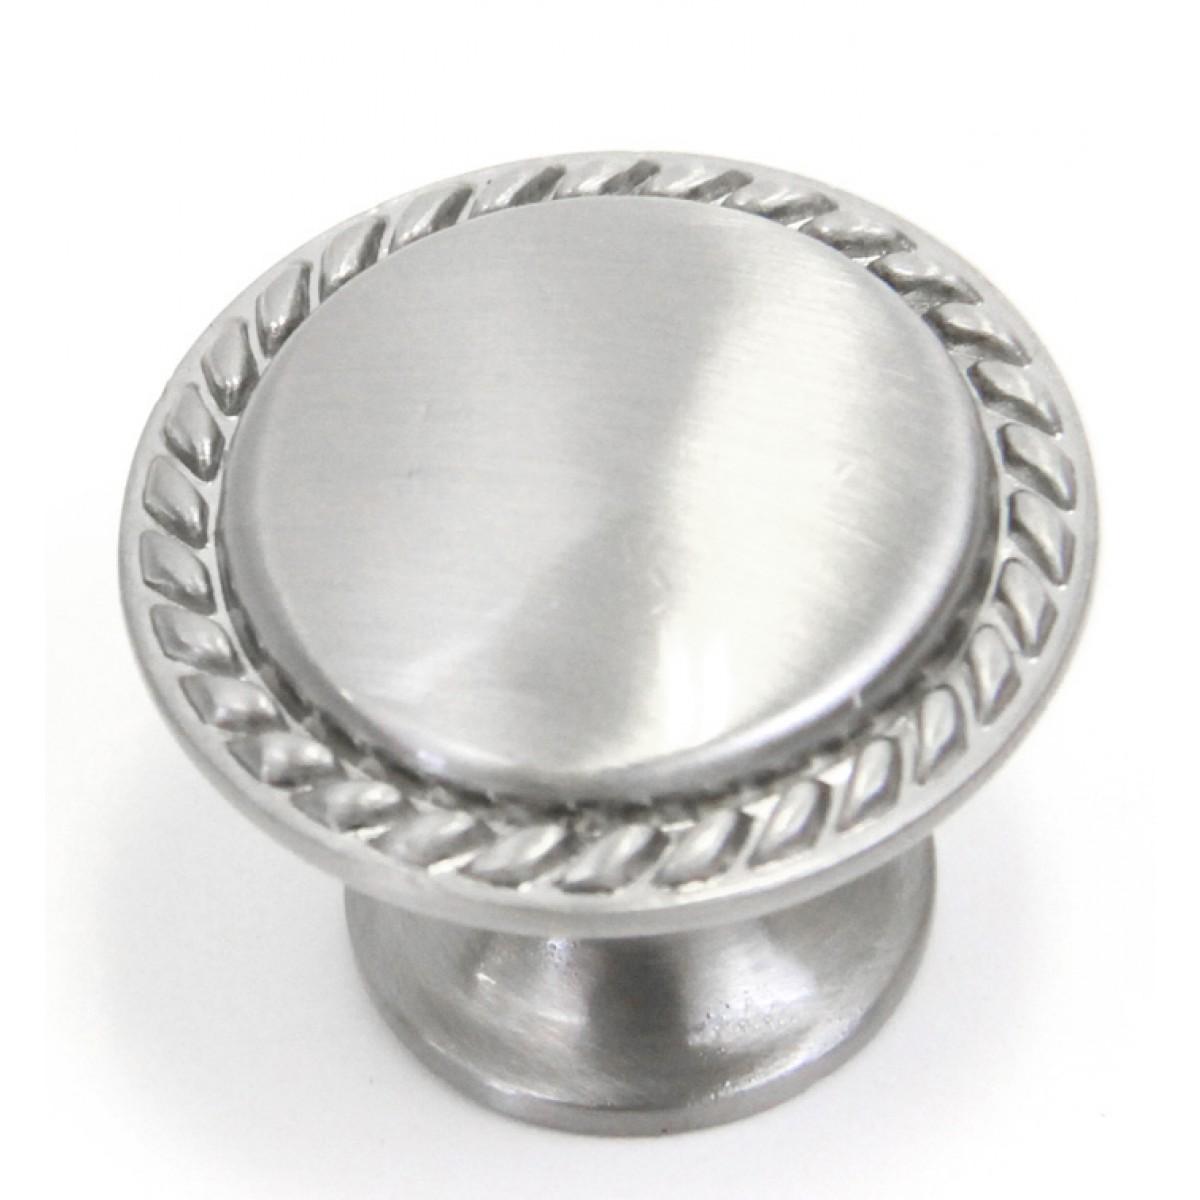 Bead Cabinet Hardware Pull Knob Brushed Nickel Finish